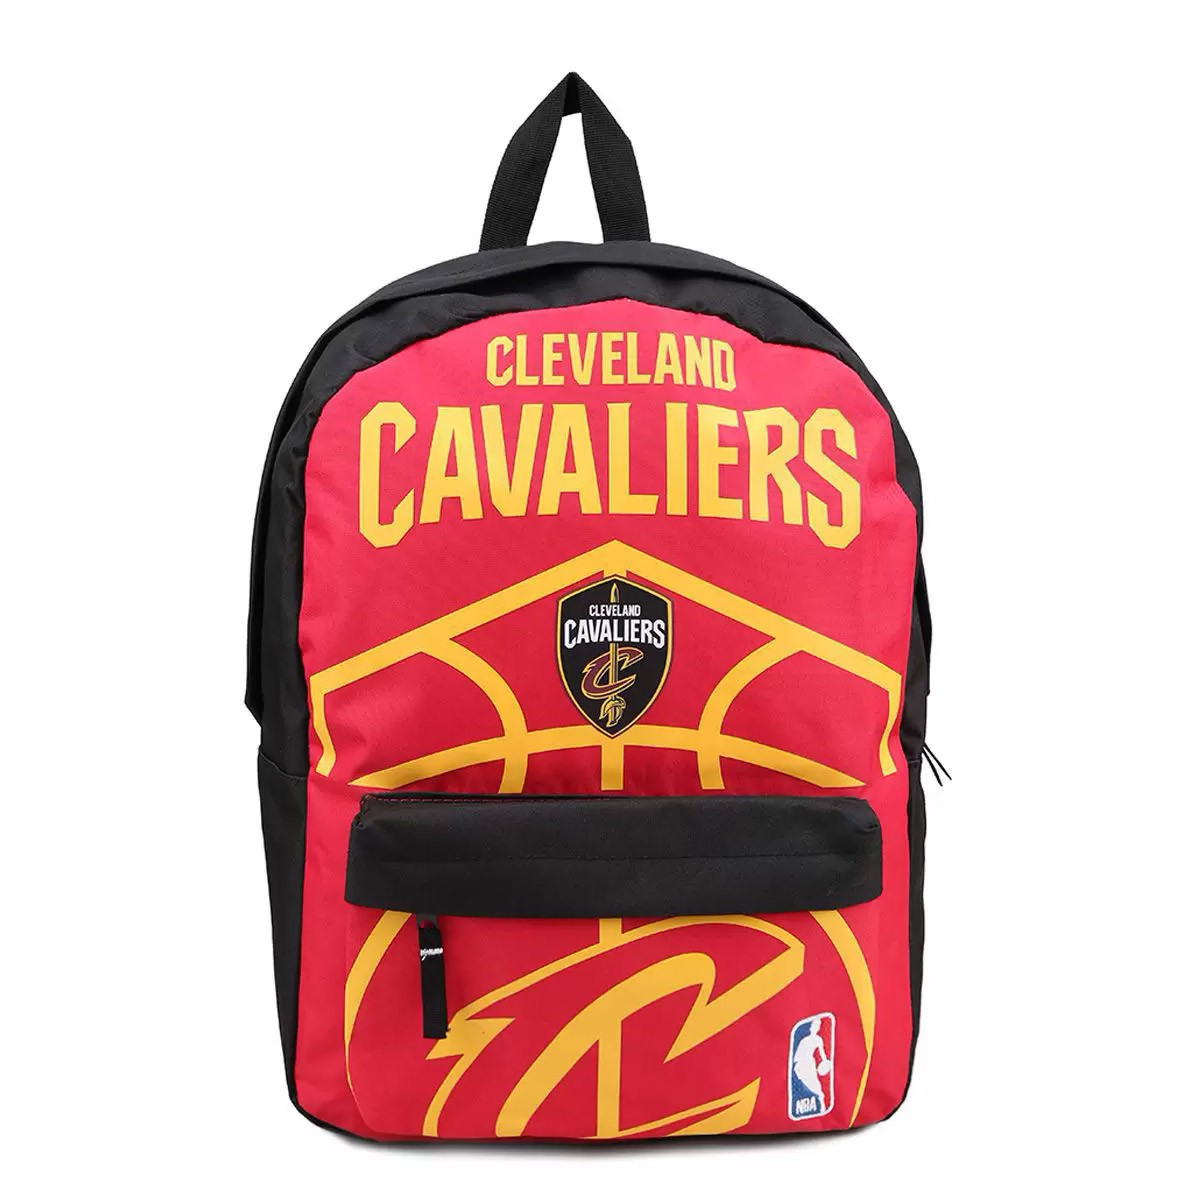 Mochila Cleveland Cavaliers Grande 49181 DERMIWIL